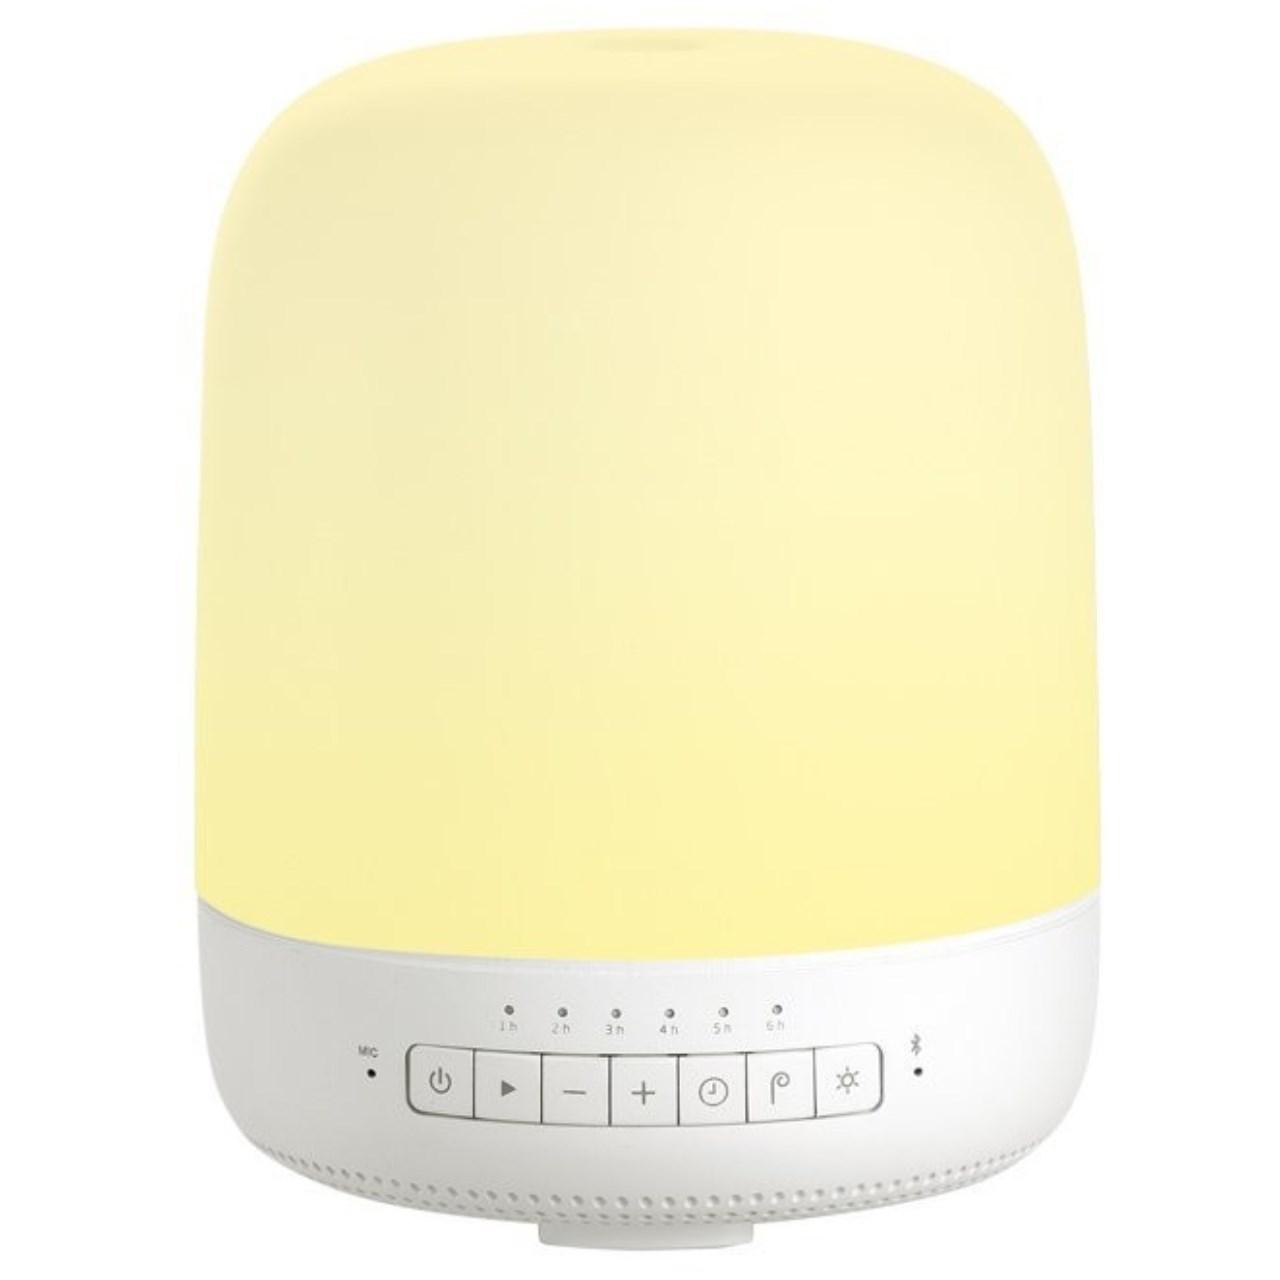 اسپیکر بلوتوثی و لامپ هوشمند ایمویی مدل H0027